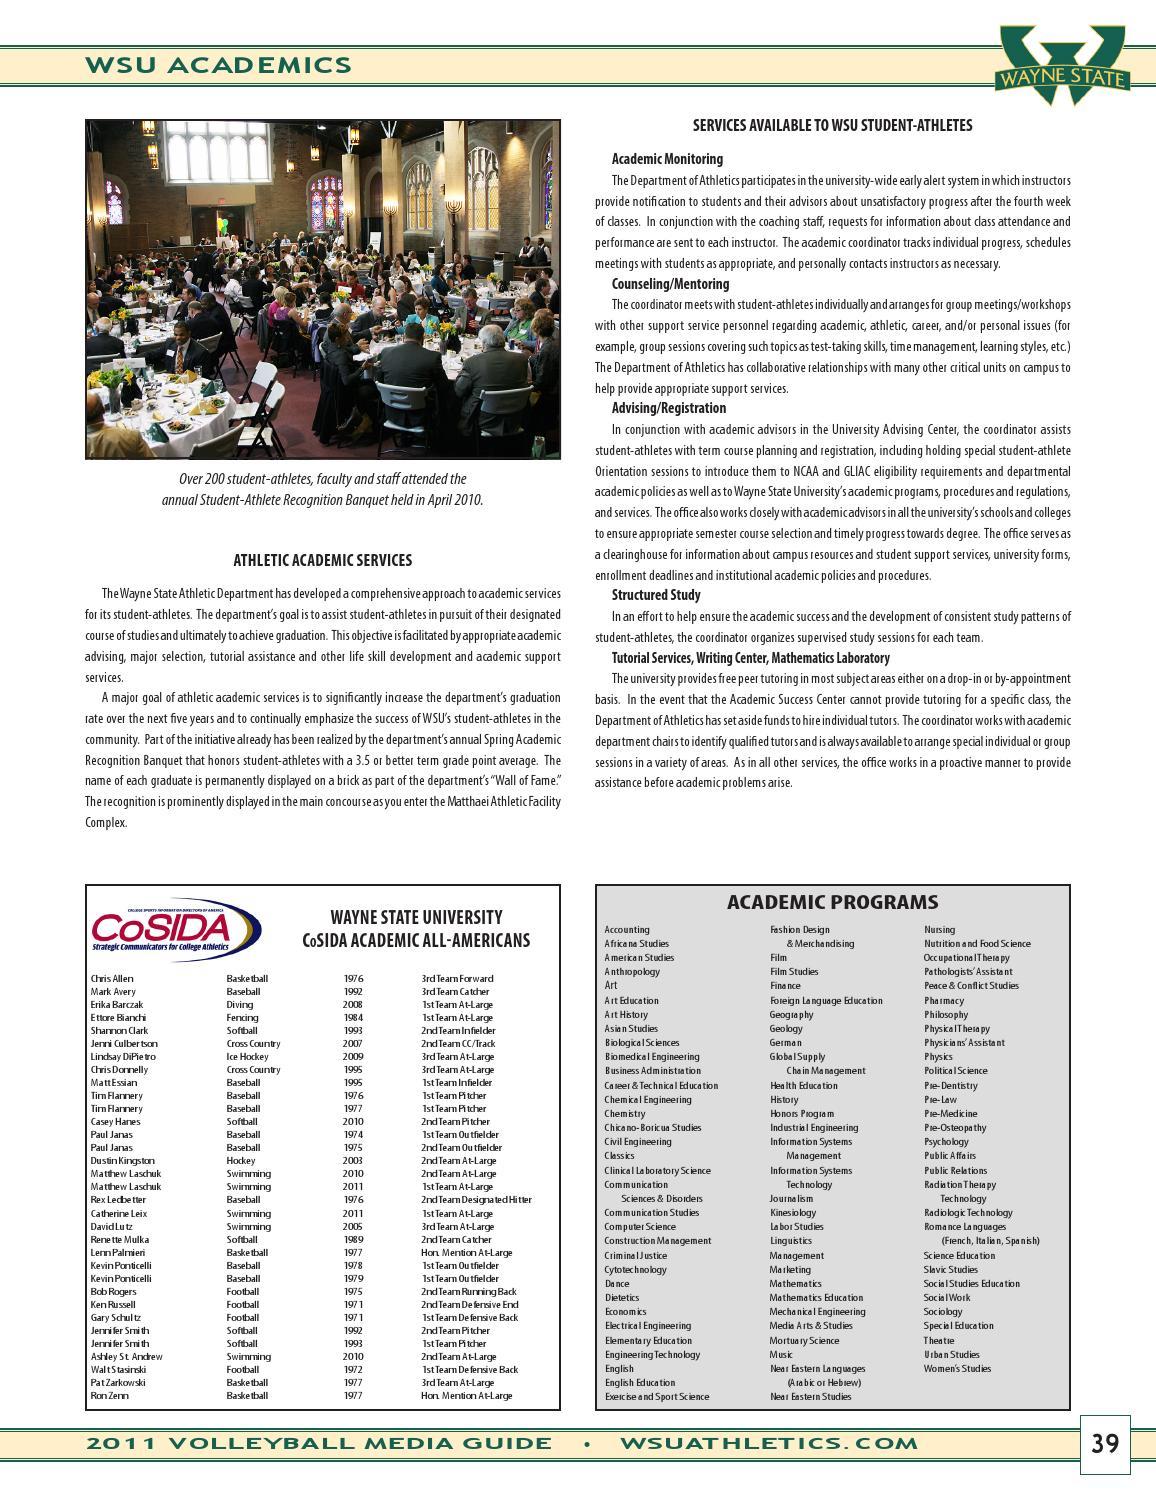 2011 Wayne State University Volleyball Media Guide By Wayne State University Warriors Issuu